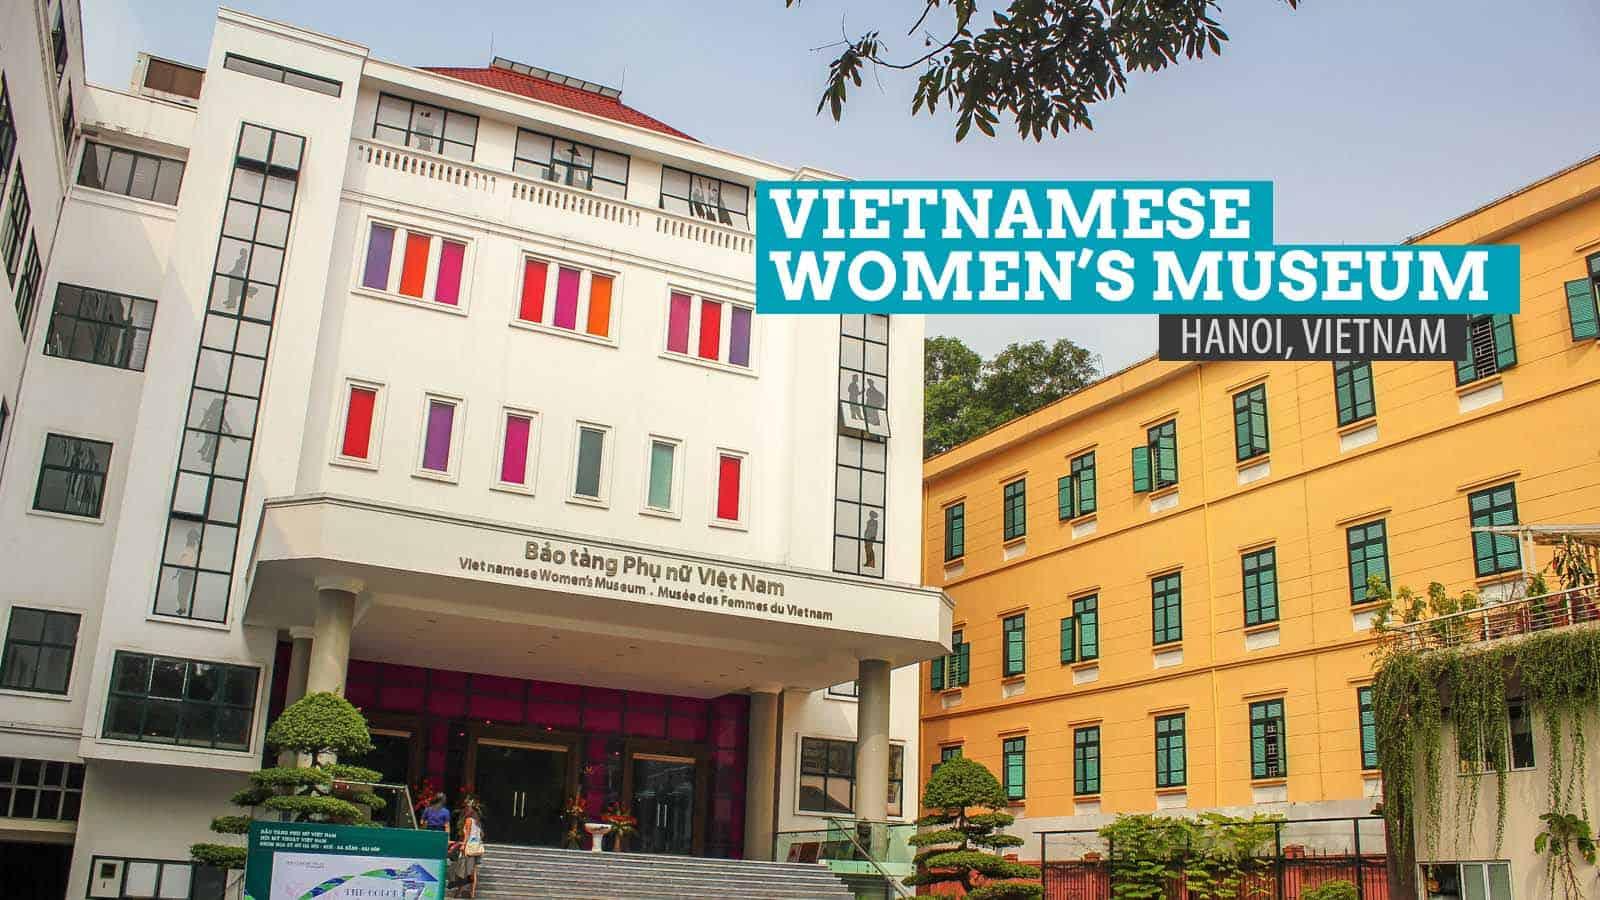 VIETNAMESE WOMEN'S MUSEUM IN HANOI